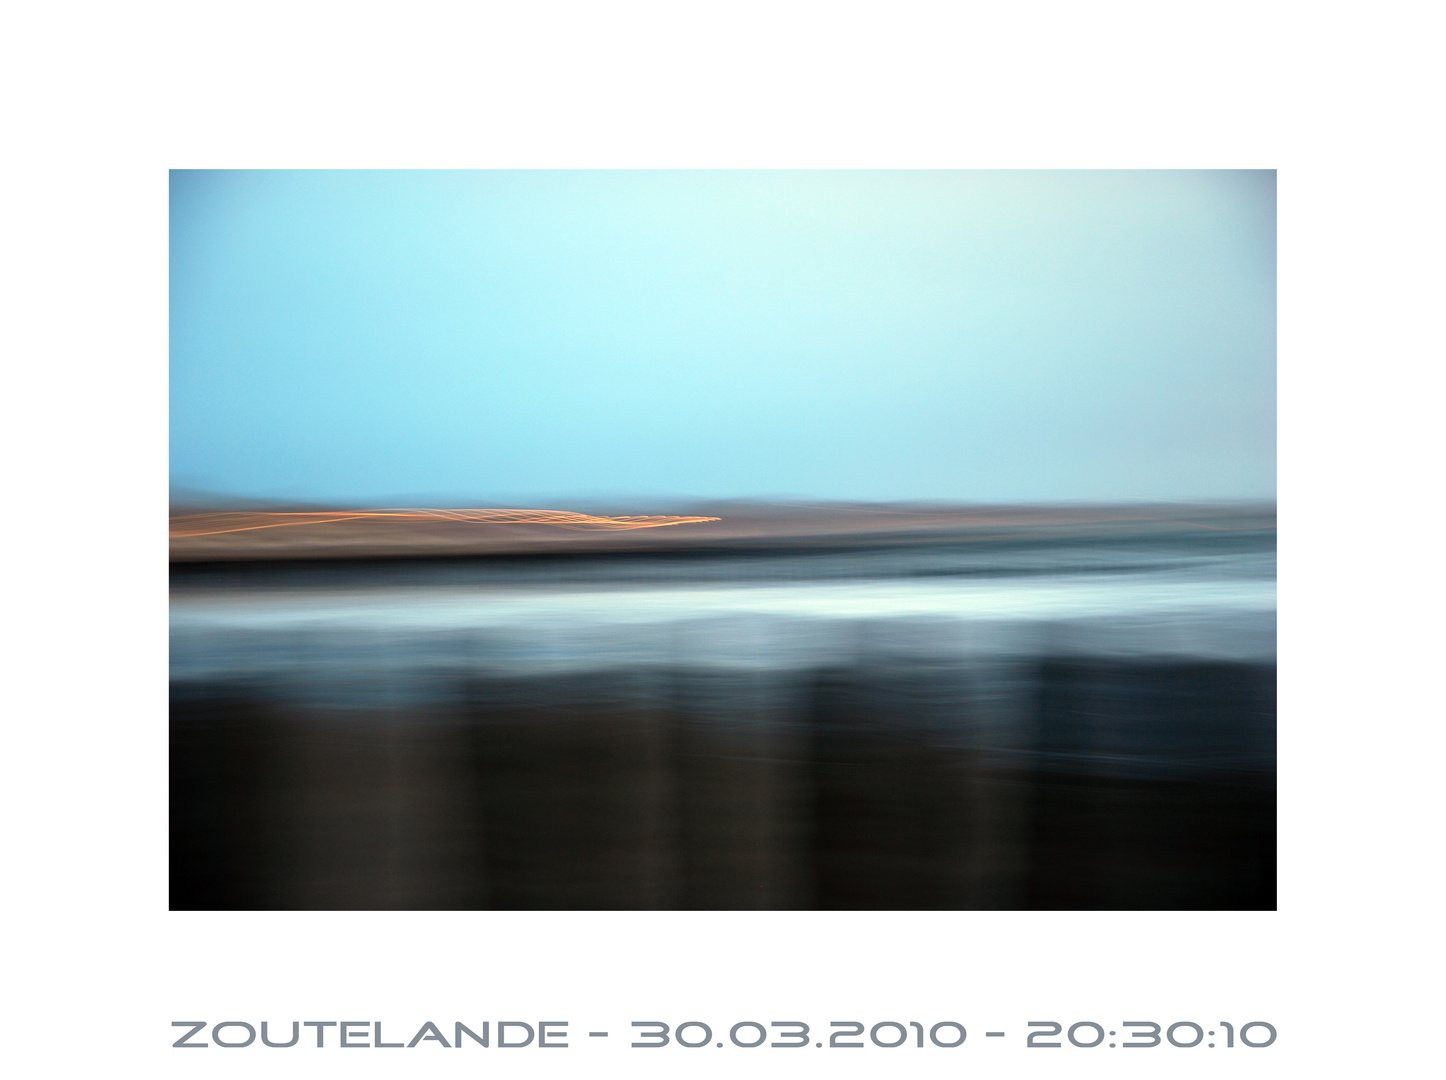 zoutelande - 30.03.2010 - 20:30:10